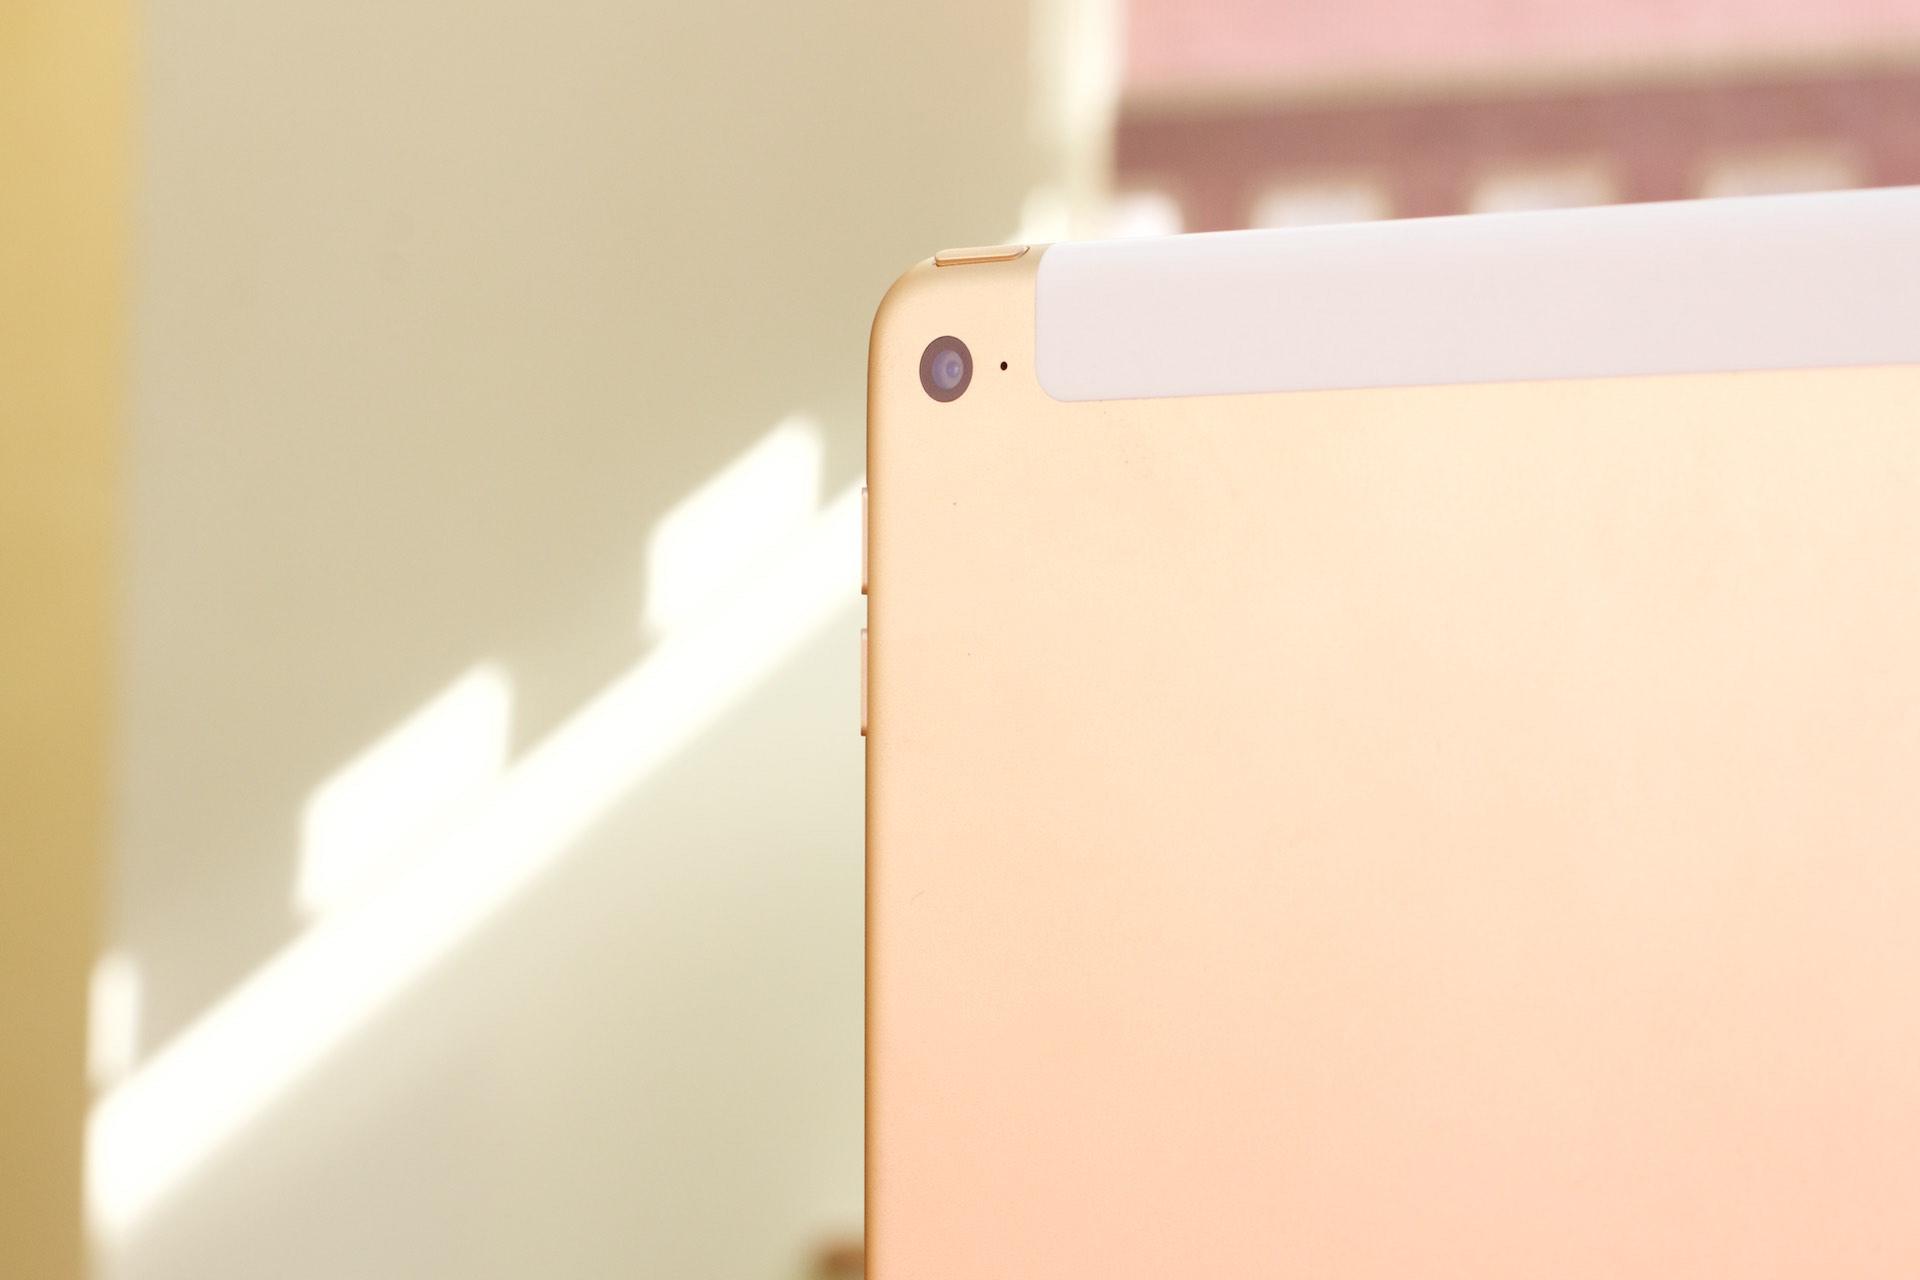 apple-ipad-air-2-review 4.jpg